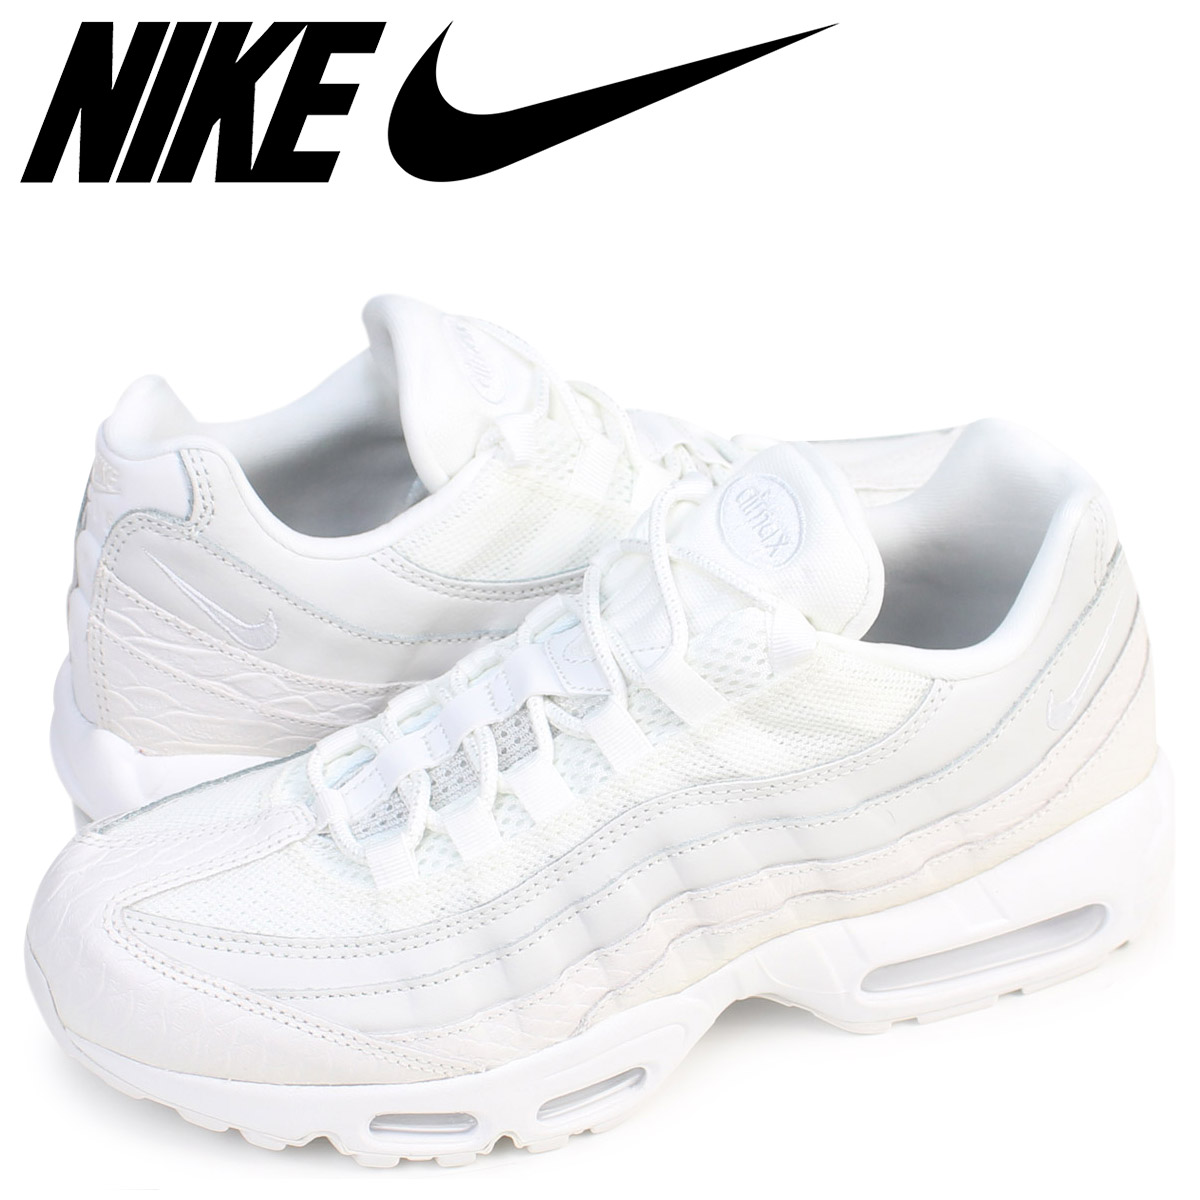 super popular 20b0e 8dded NIKE Kie Ney AMAX 95 sneakers AIR MAX 95 PREMIUM 538,416-100 men's shoes  white [7/15 Shinnyu load] [177]